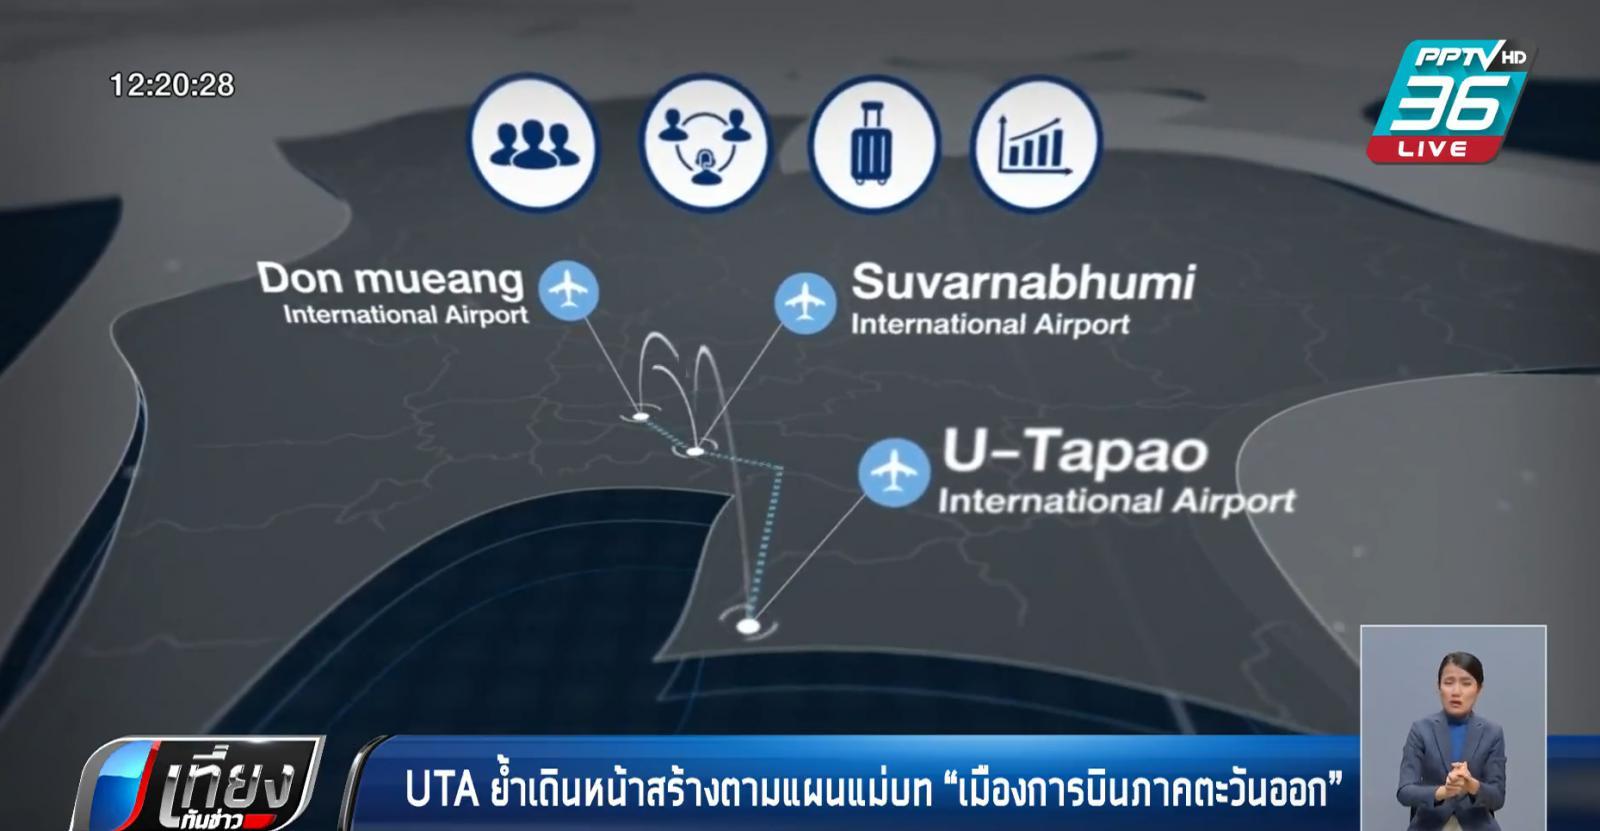 "UTA ย้ำเดินหน้าสร้างตามแผนแม่บท ""เมืองการบินภาคตะวันออก"""